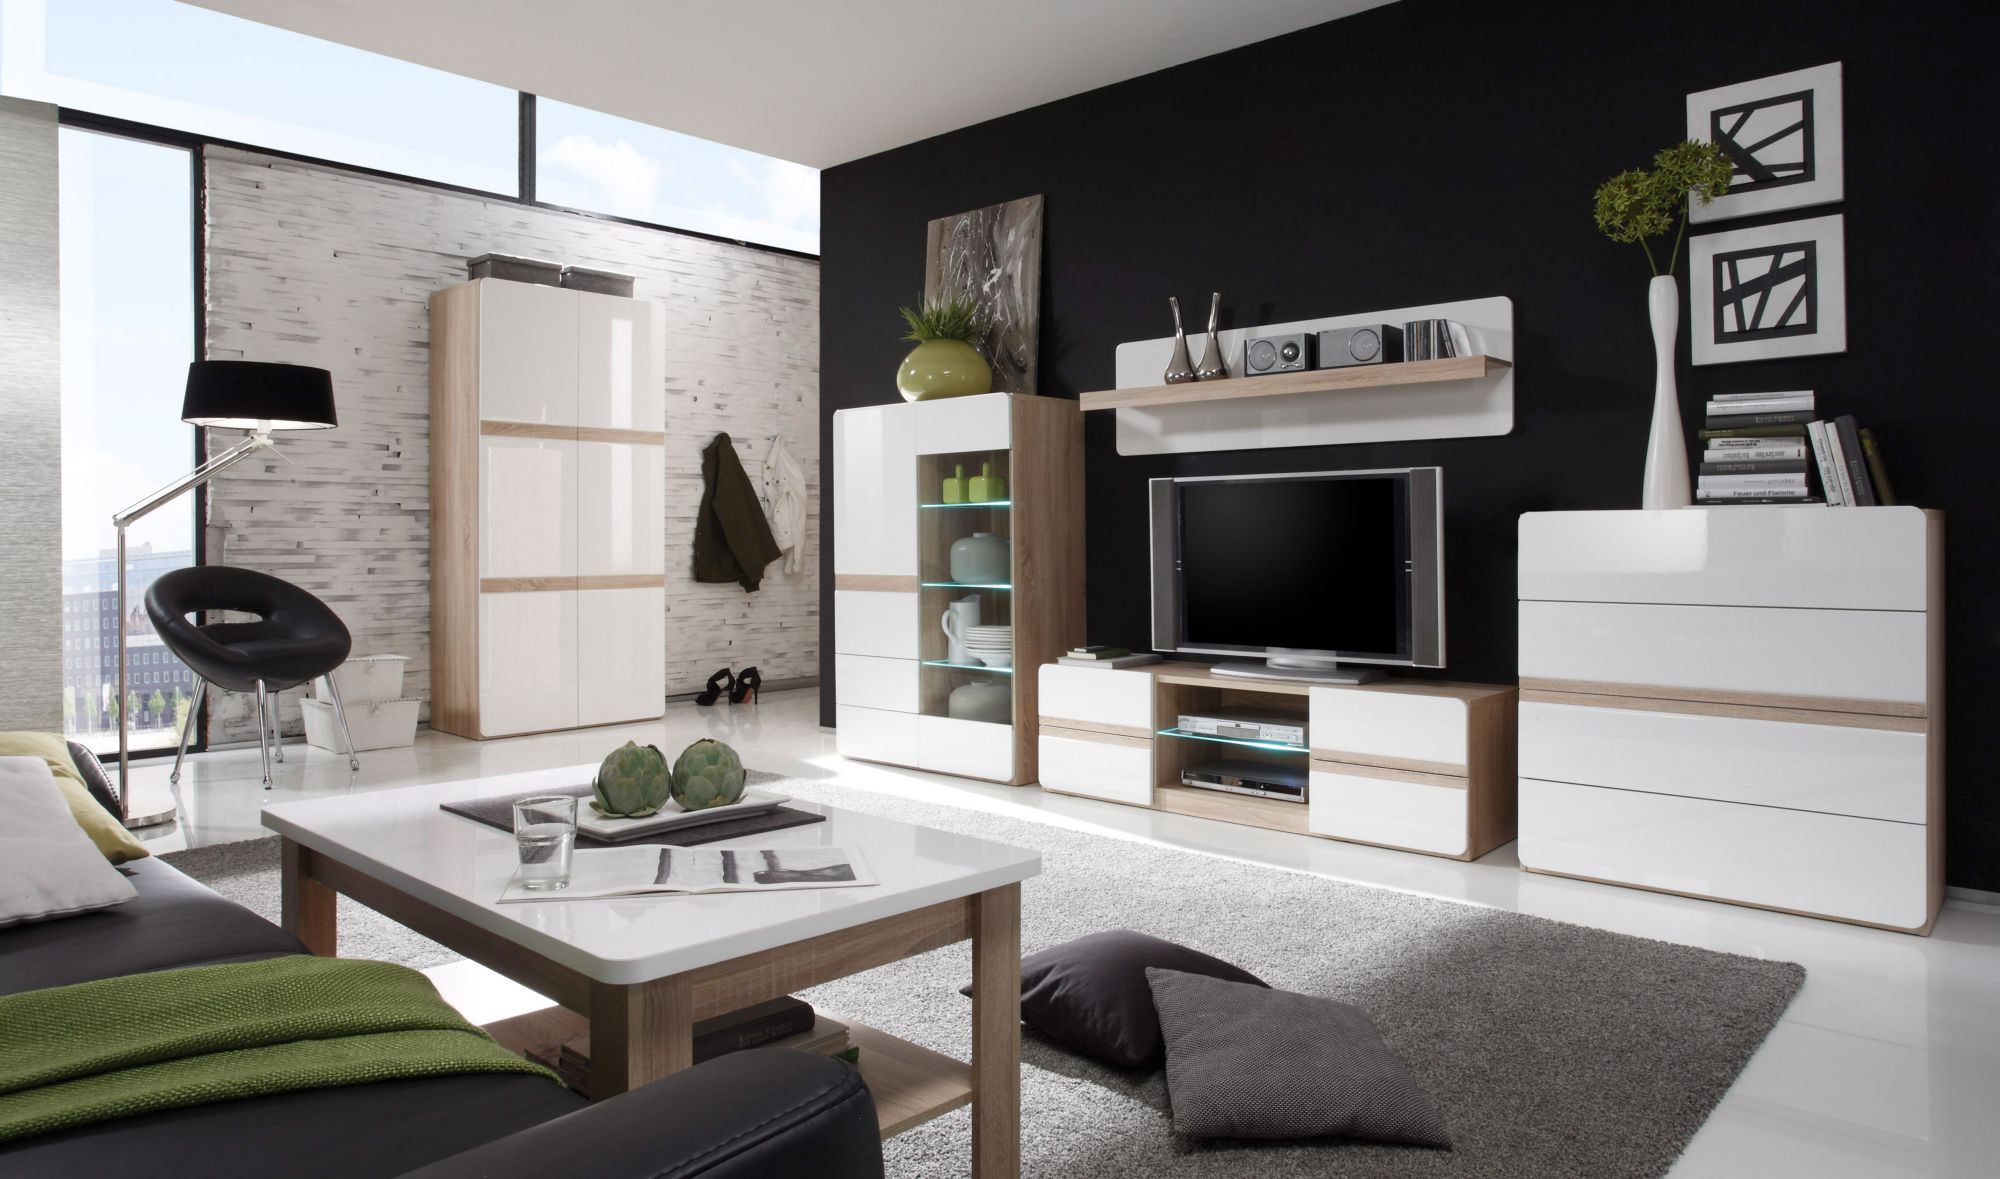 wohnwand 4 tlg schwab versand moderne wohnw nde. Black Bedroom Furniture Sets. Home Design Ideas